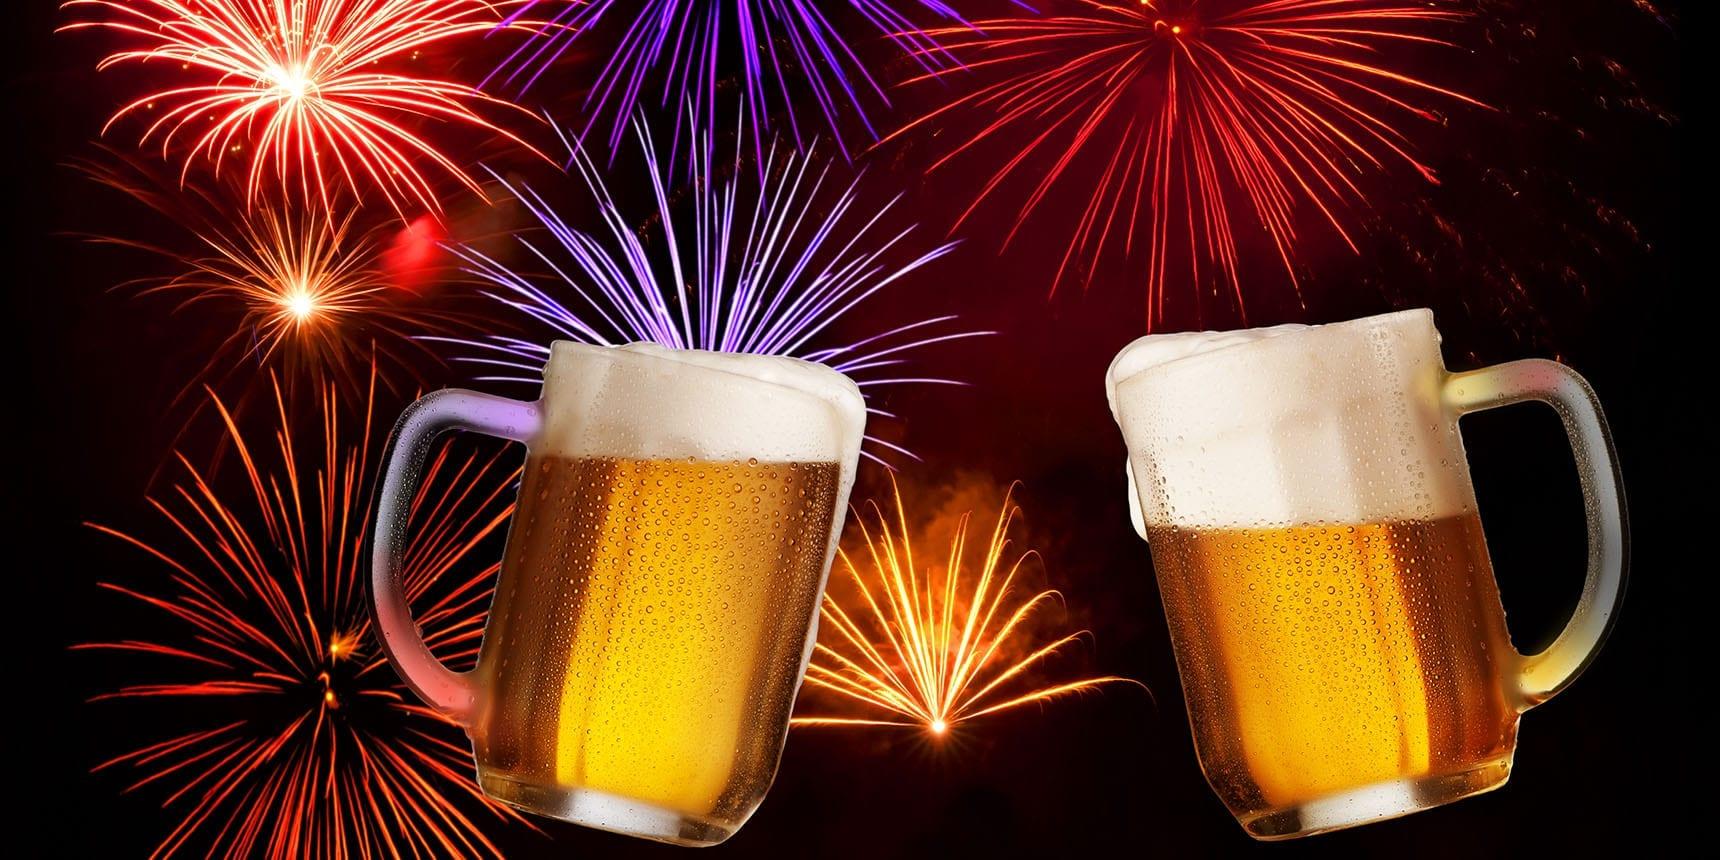 Utah Beer News - 2018 Year in Review